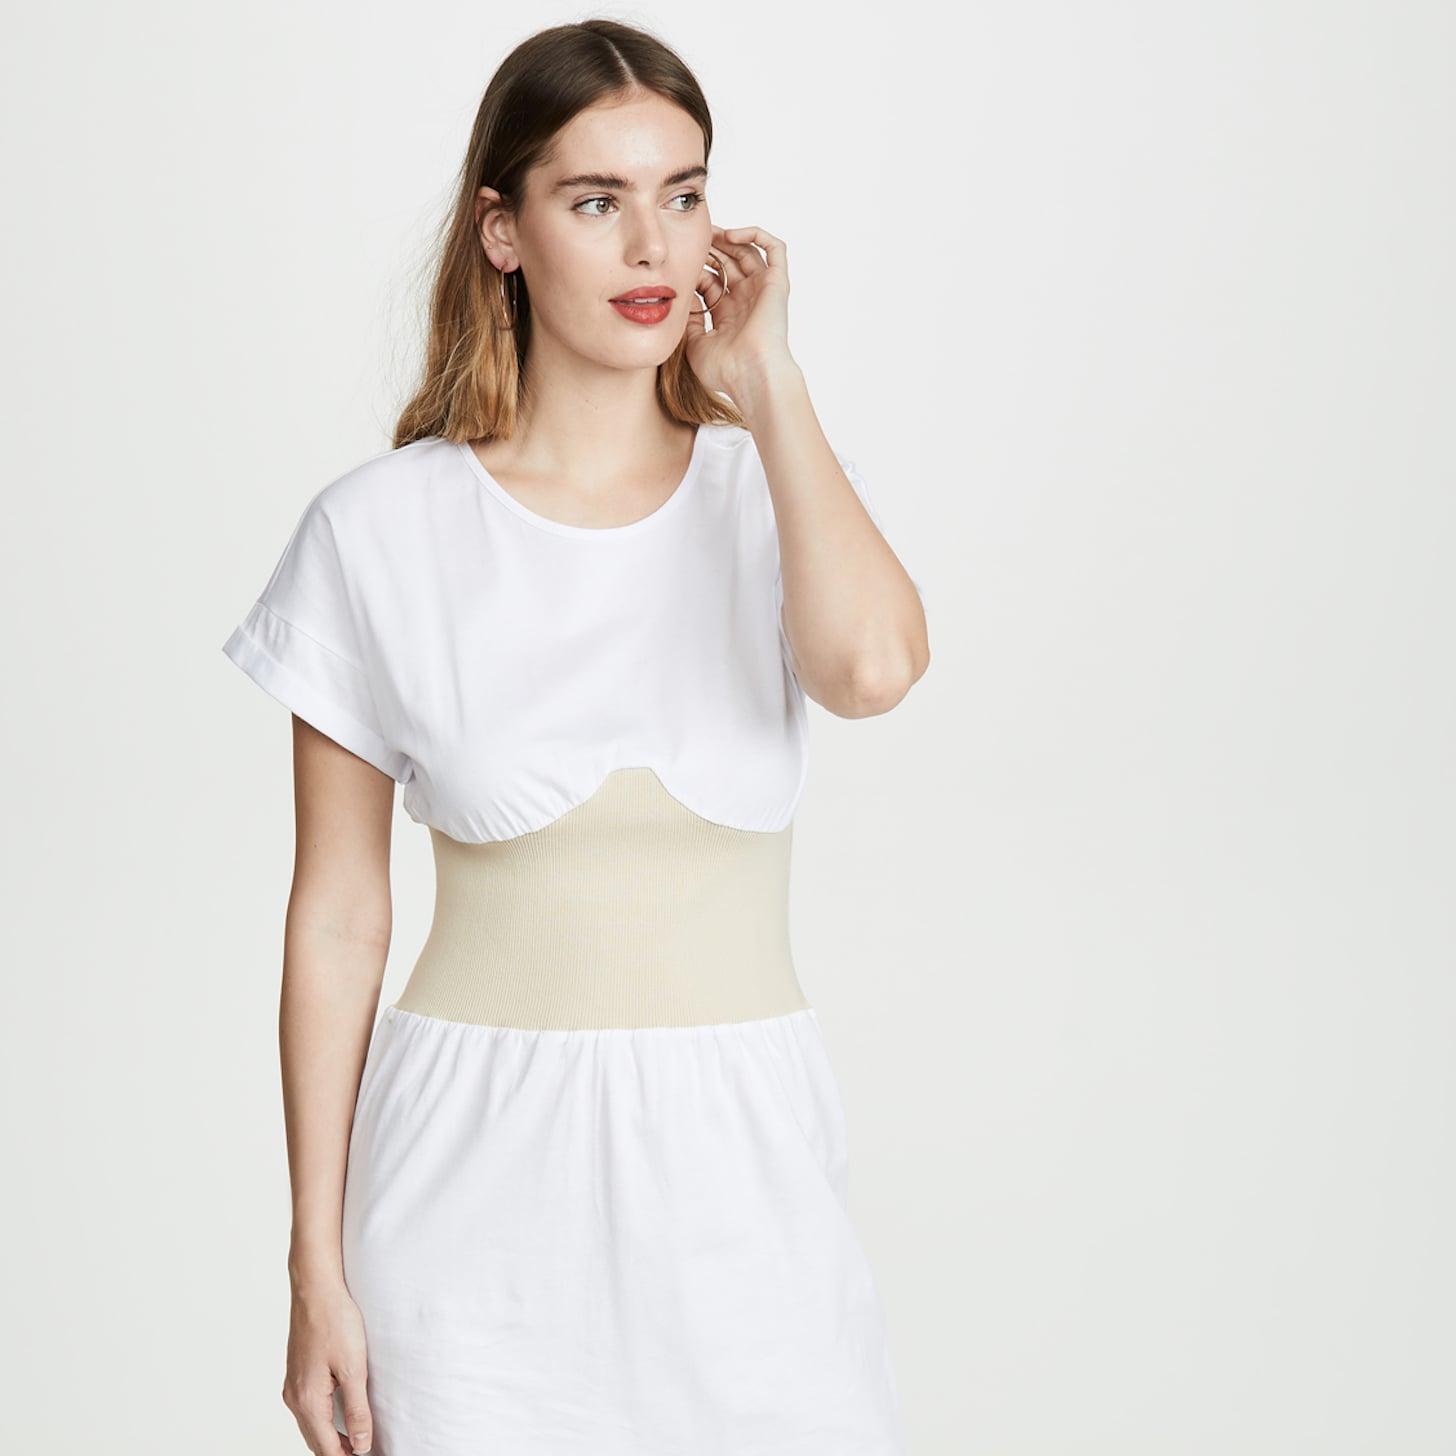 ec224b1b0084 Best T-Shirt Dresses | POPSUGAR Fashion